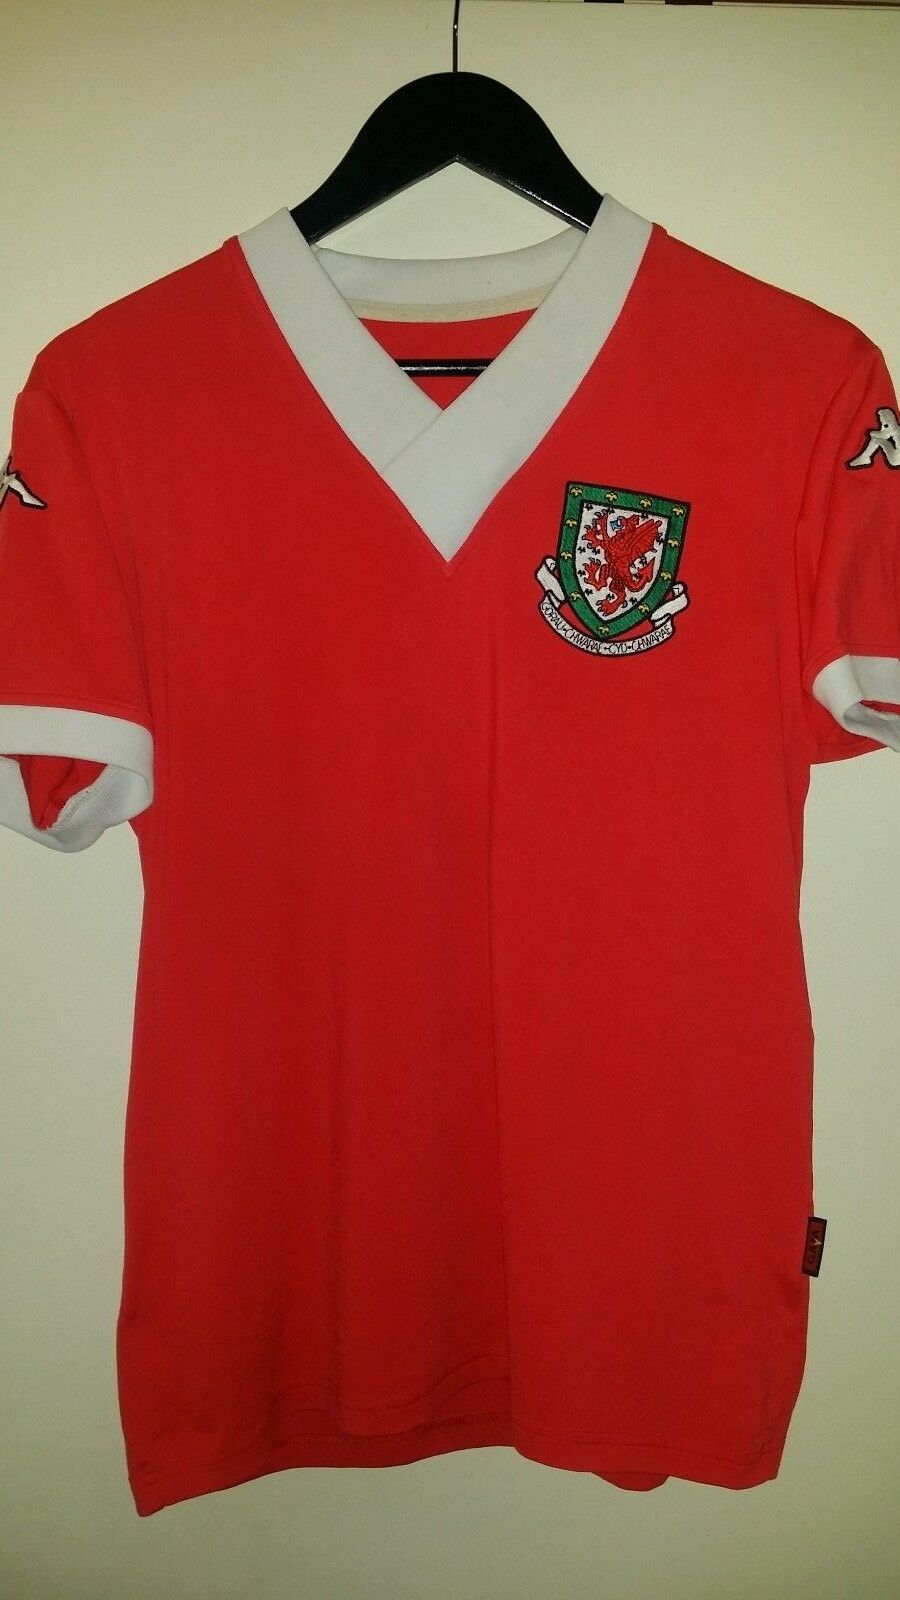 0c02ca98411 Jersey football Wales 2006 kappa L red nvwkoy8146-Men - www ...